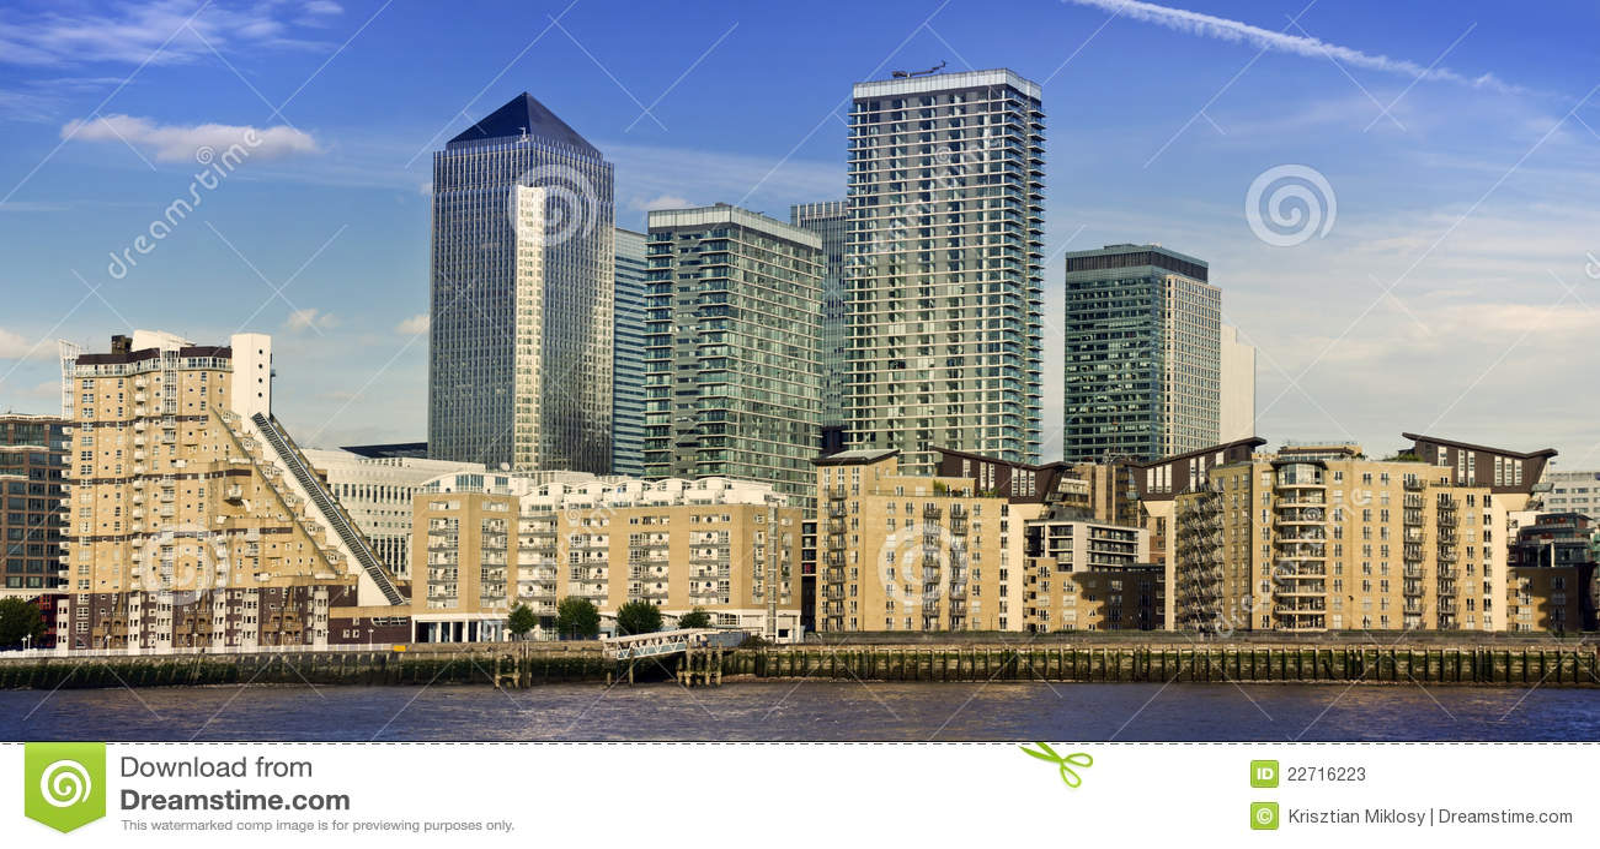 canary wharf london uk stock photos   image 22716223